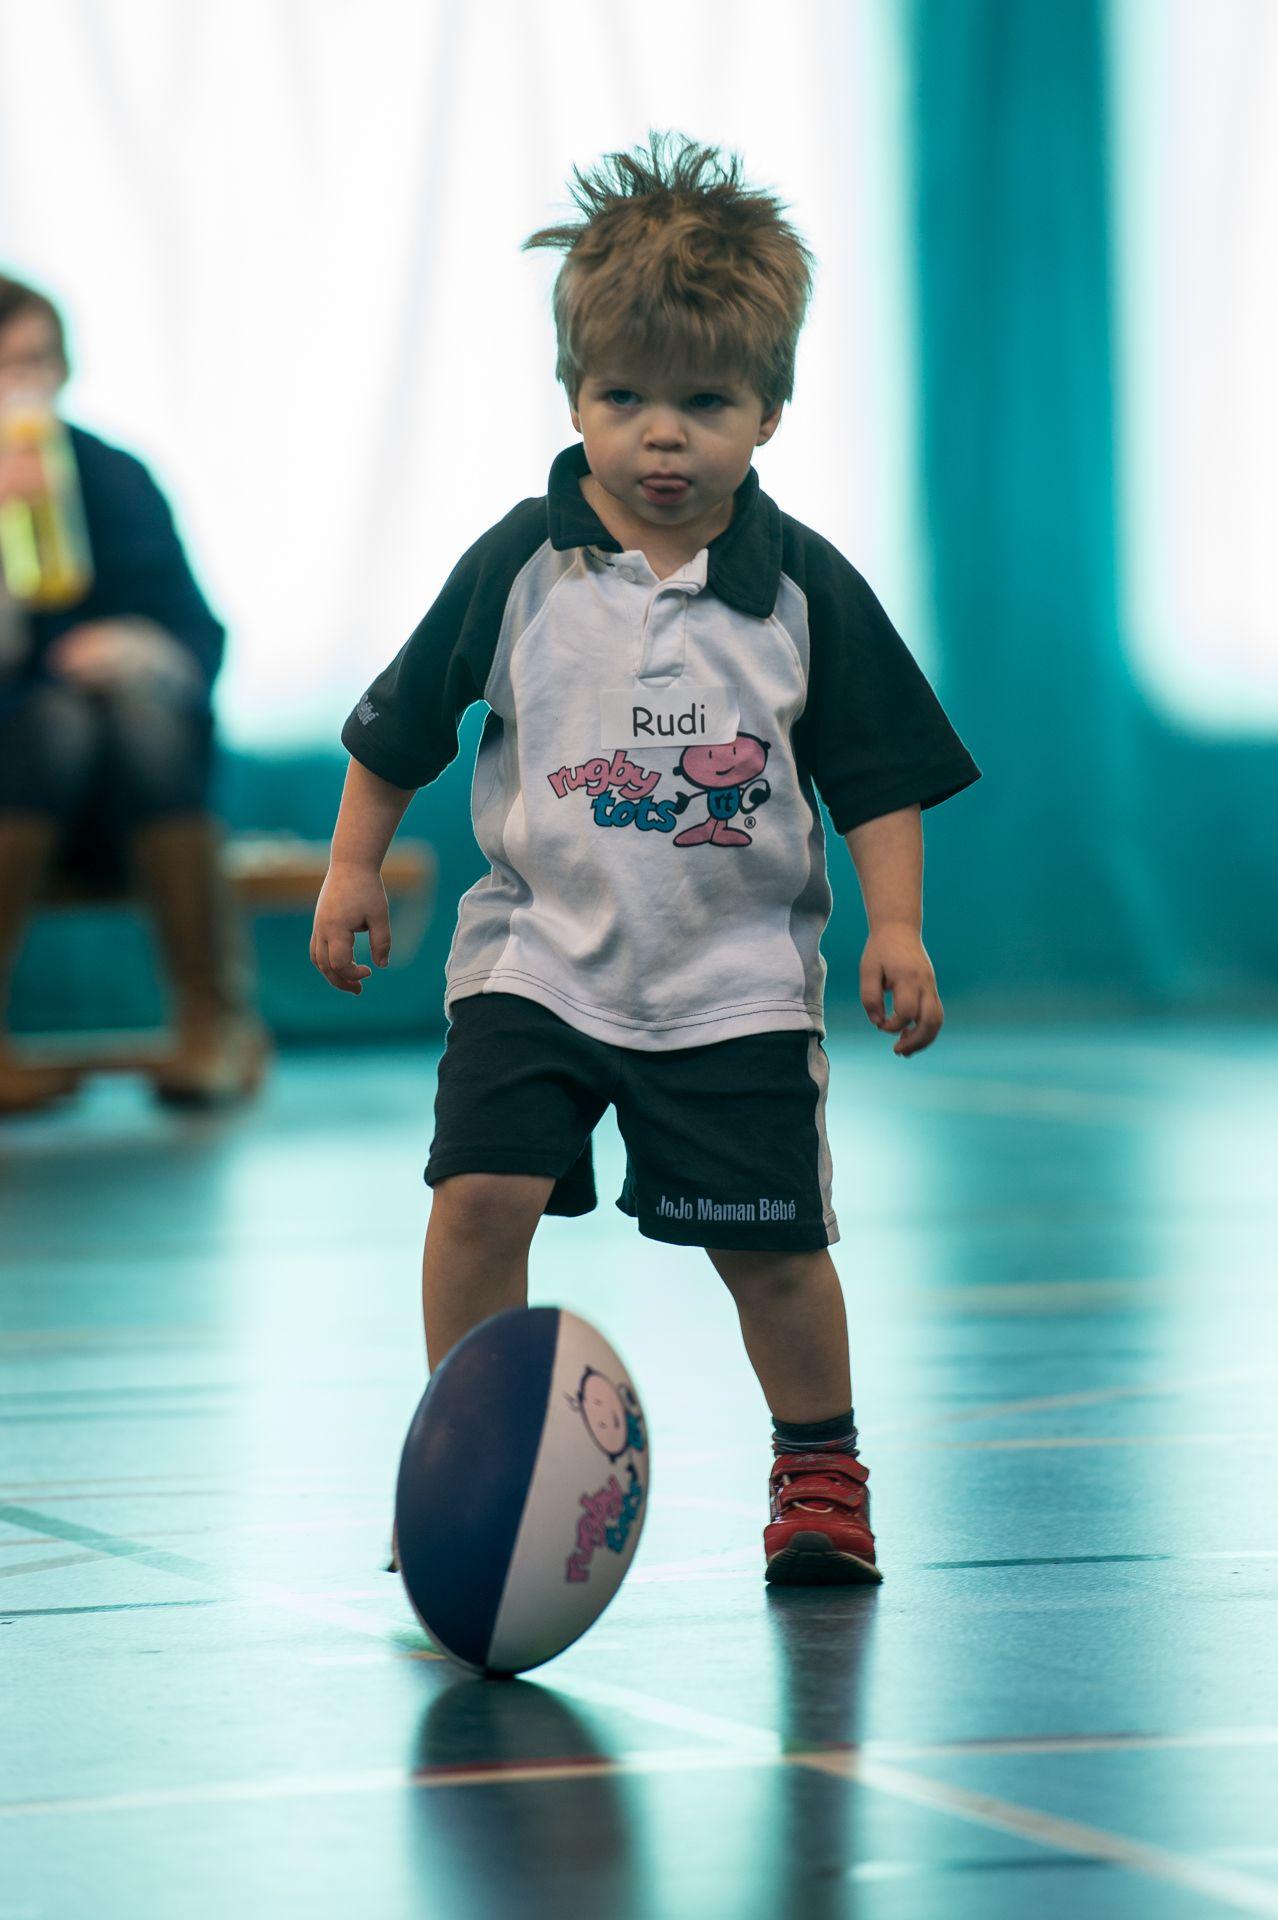 Kicking skills.